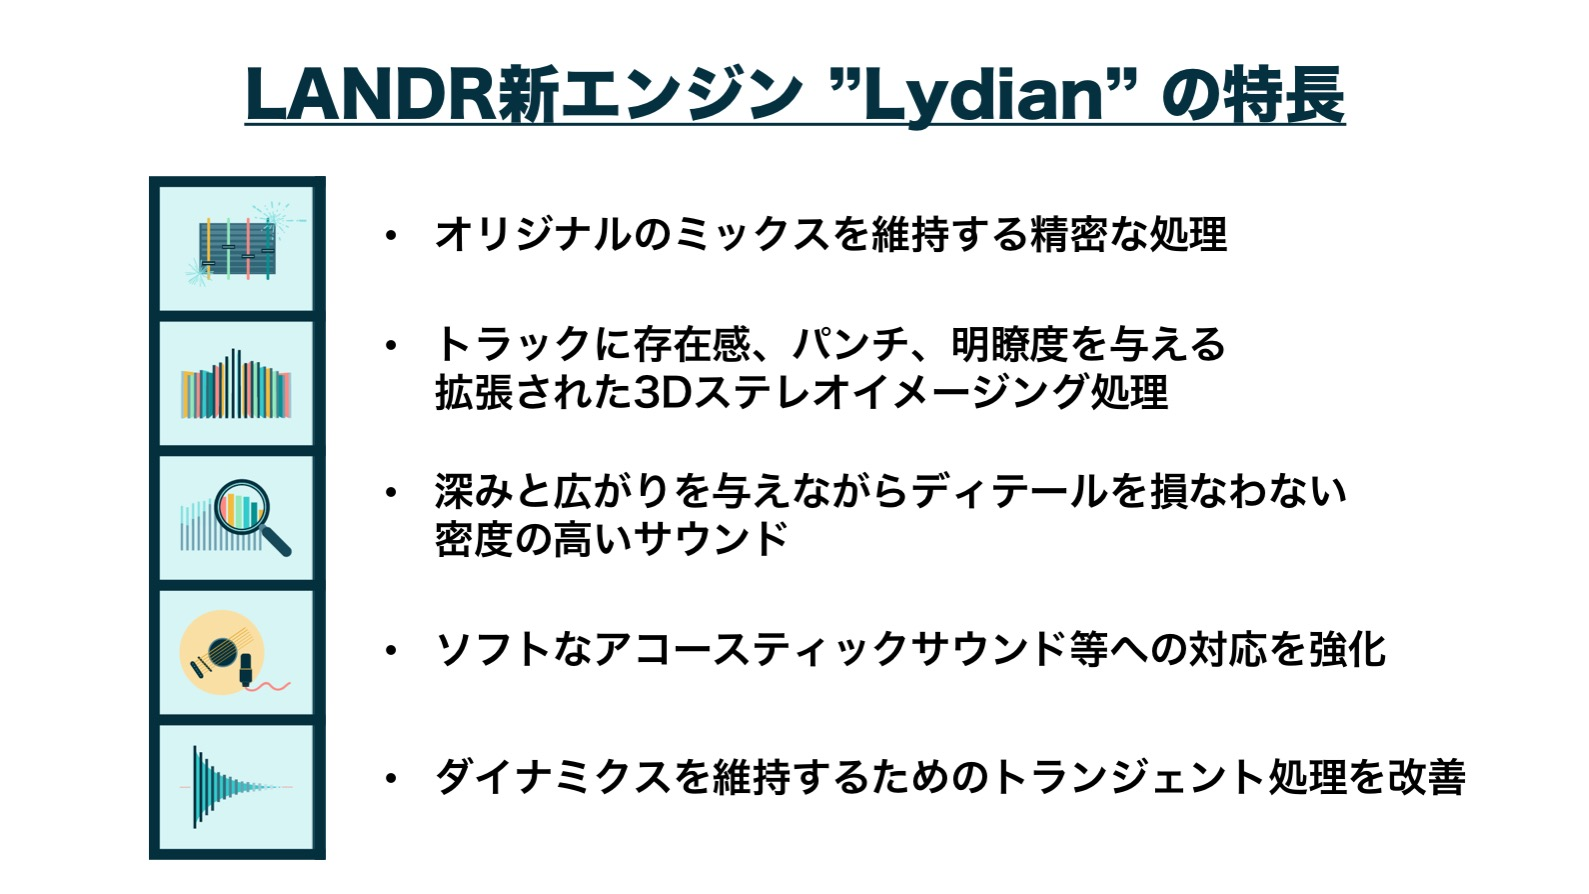 LANDR_Lydian